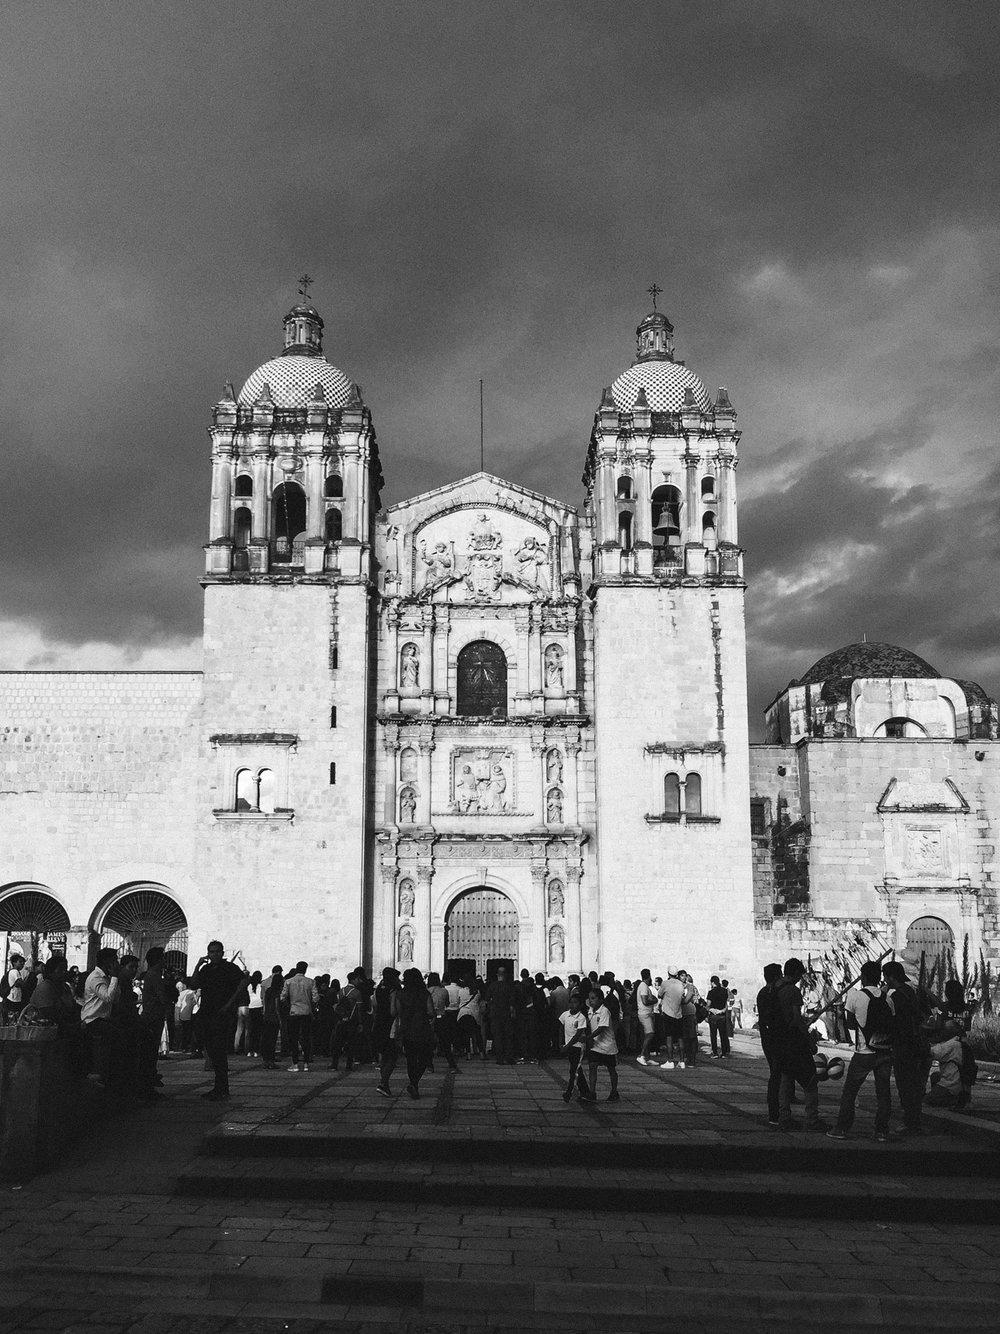 Templo de Santo Domingo de Guzman (The Church and former monastery of Santo Domingo de Guzmán is a Baroque ecclesiastical building complex in Oaxaca, Oaxaca, Mexico)